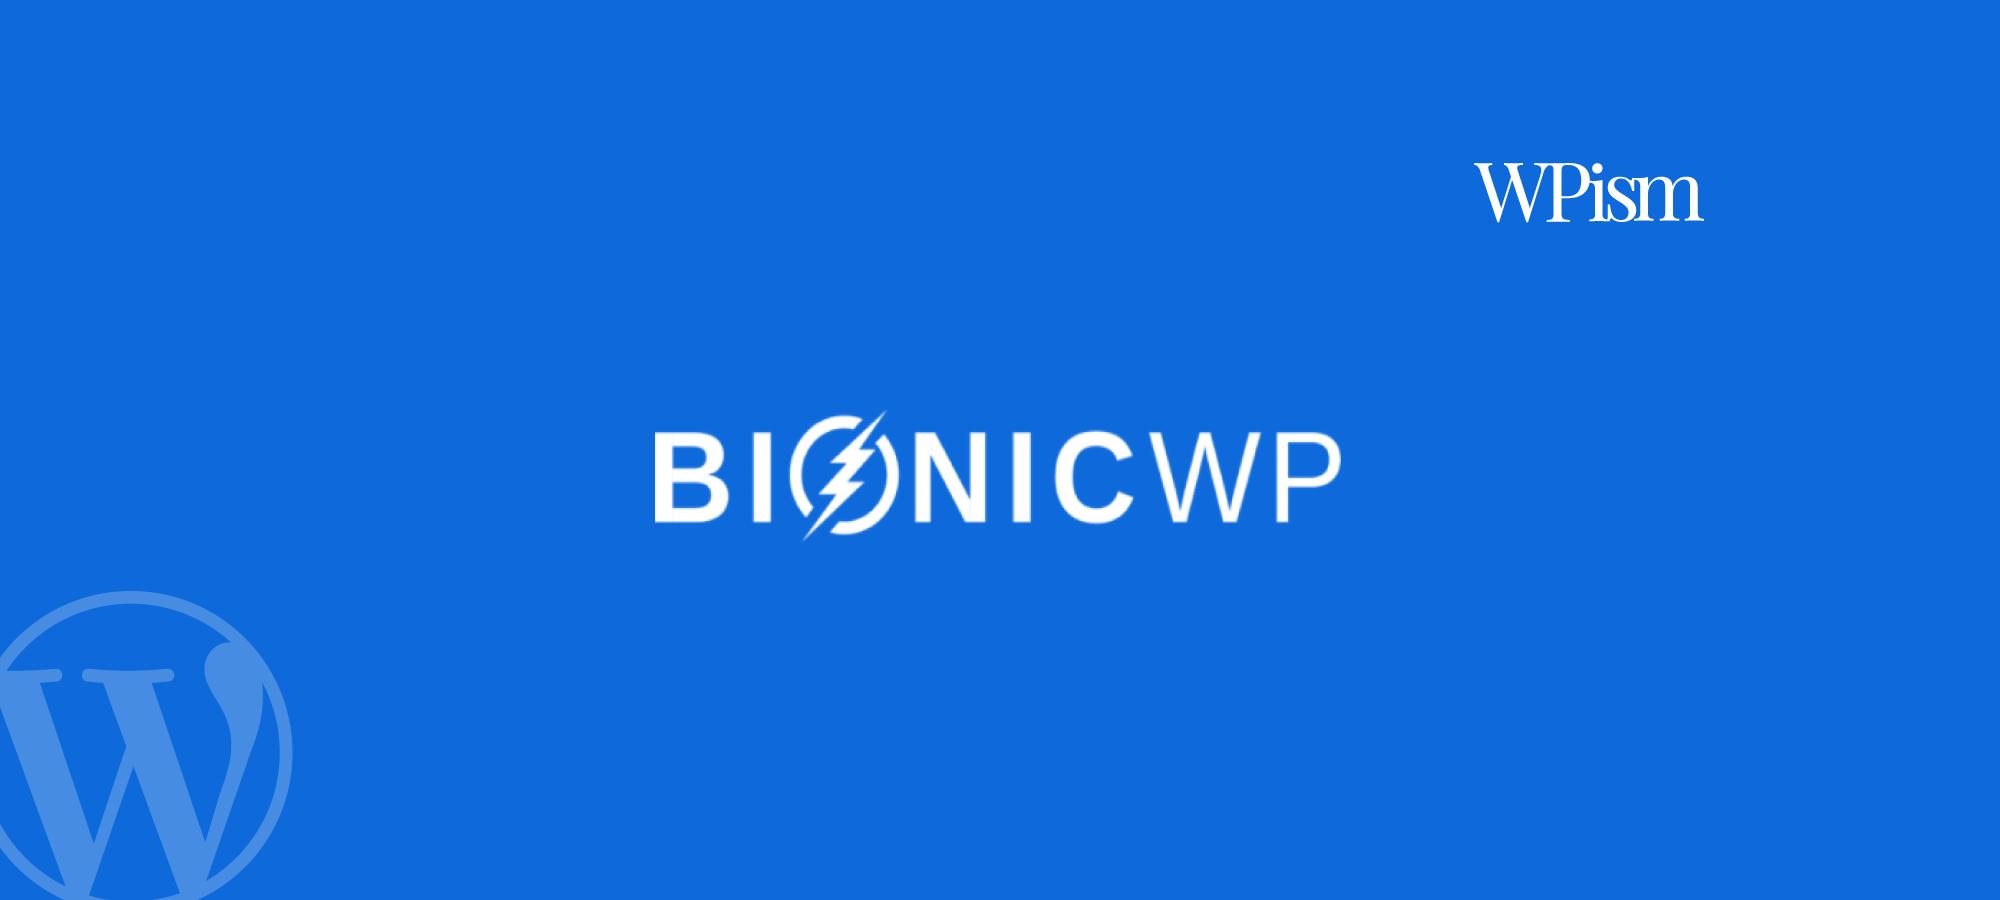 BionicWP Review – Managed WordPress Hosting